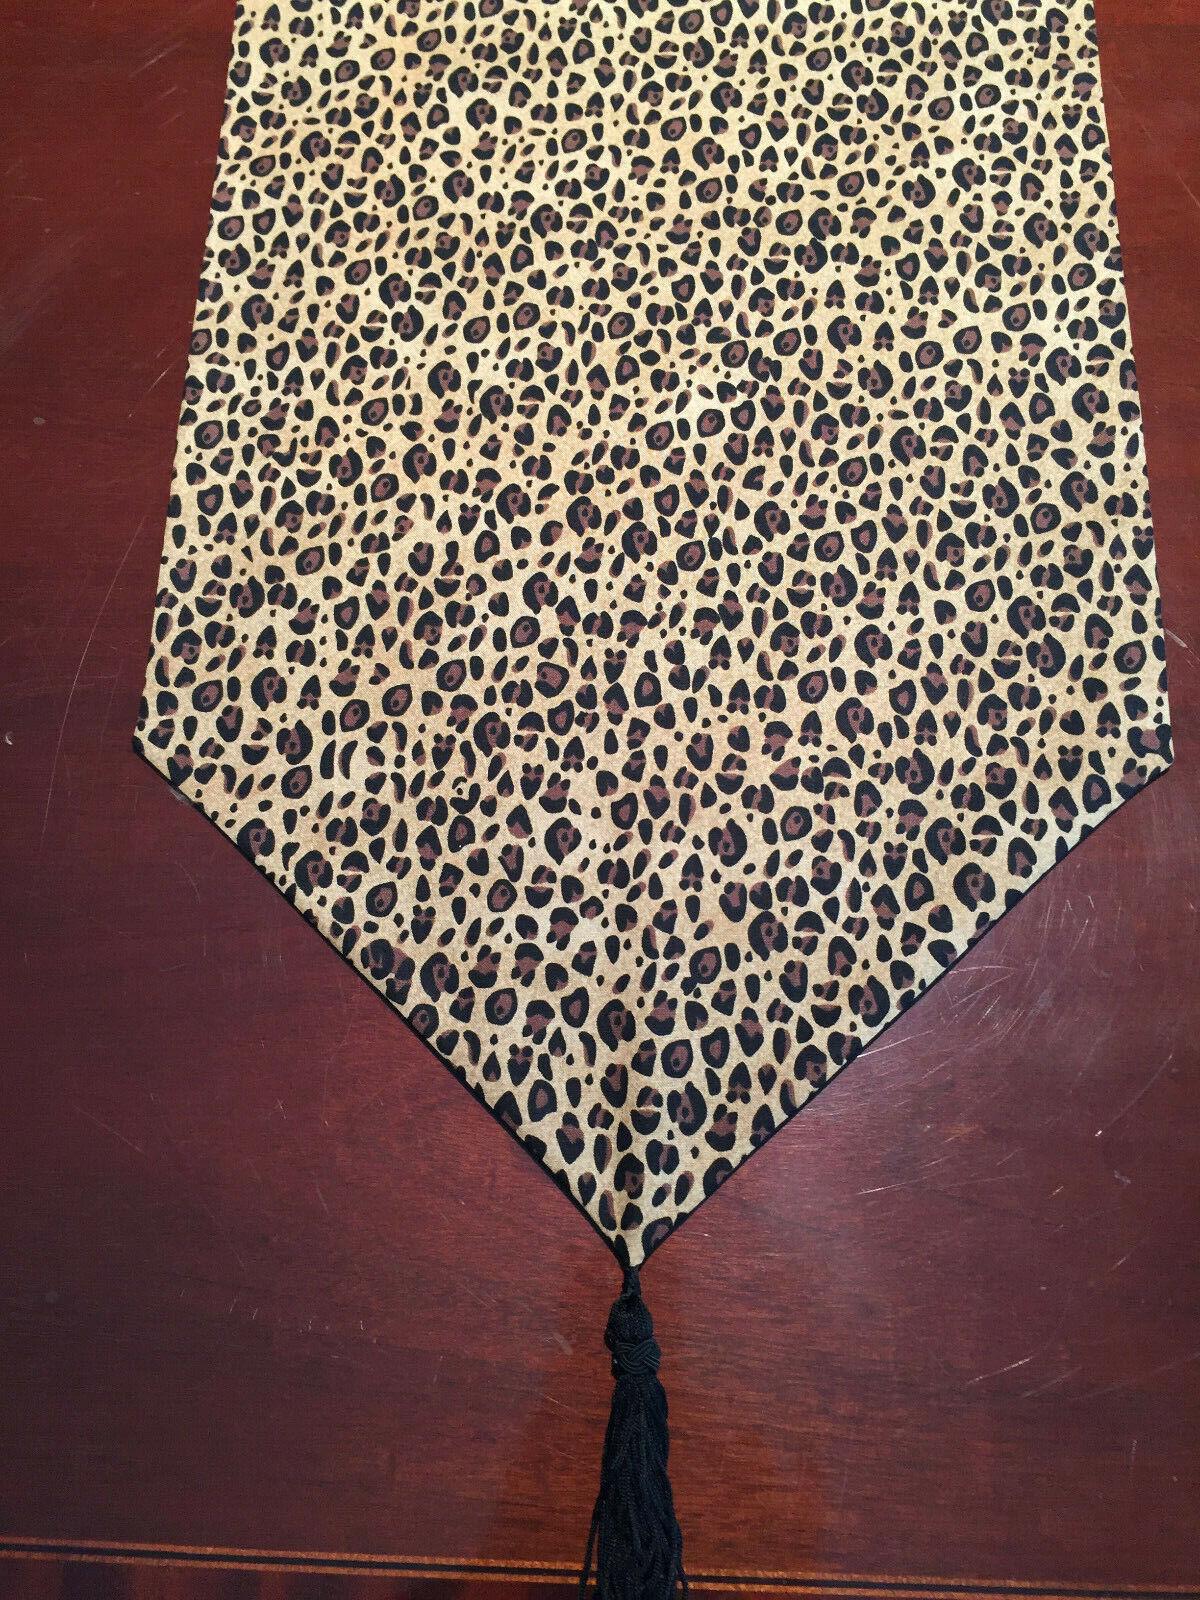 Brown Leopard Jungle Wildlife Animal Print Cotton Table Runn